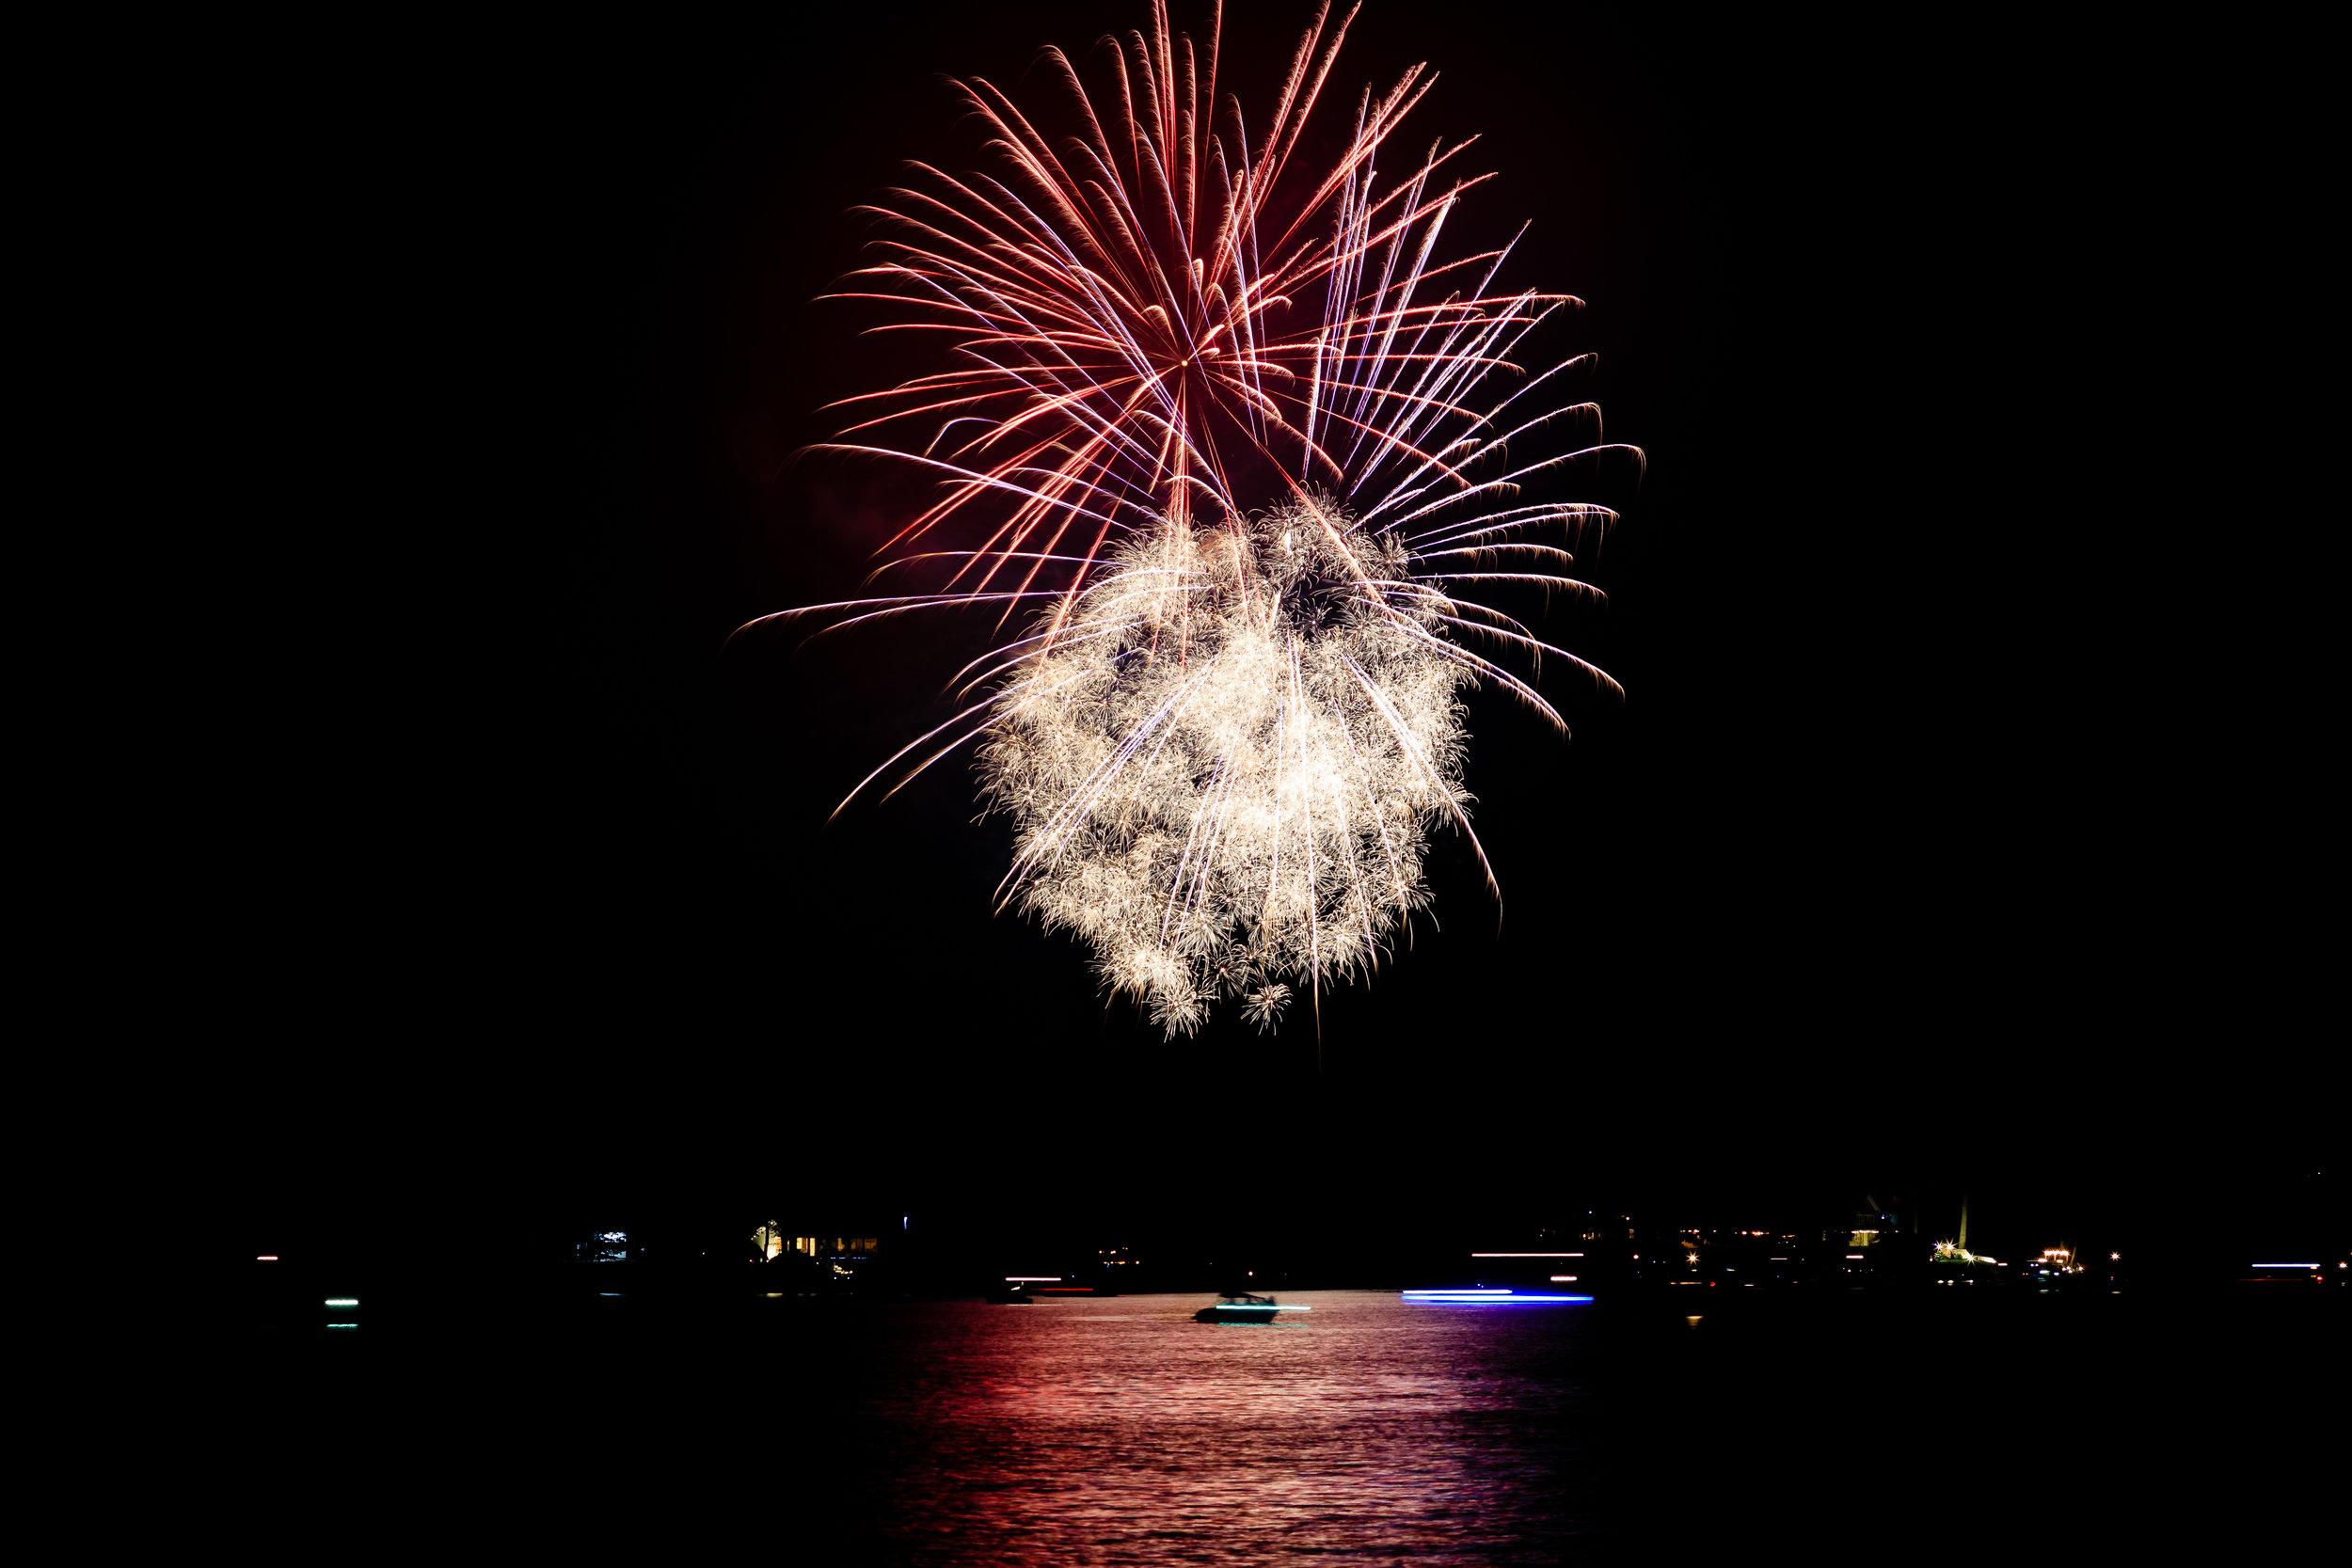 Fireworks-2582-2.jpg